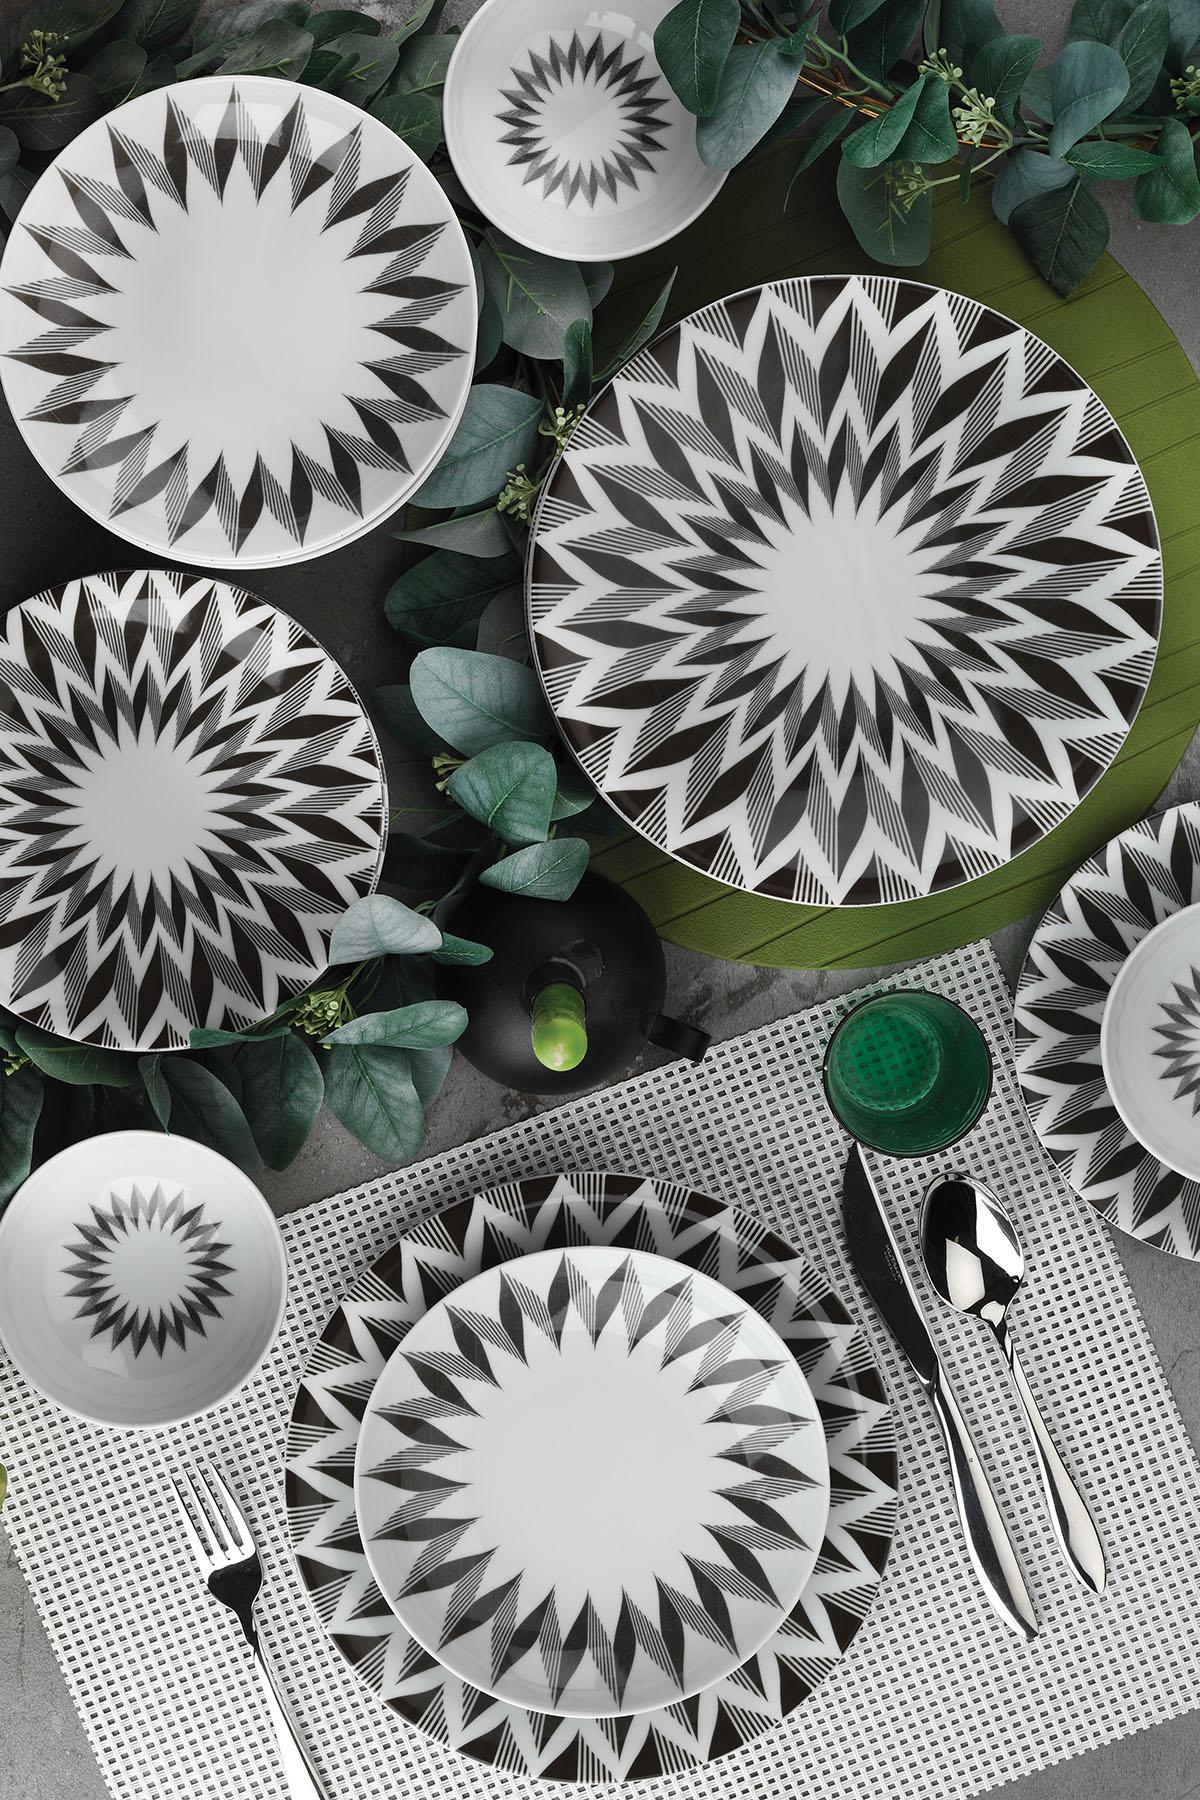 Kütahya Porselen - Kütahya Porselen Nano 24 Parça Yemek Seti 885143